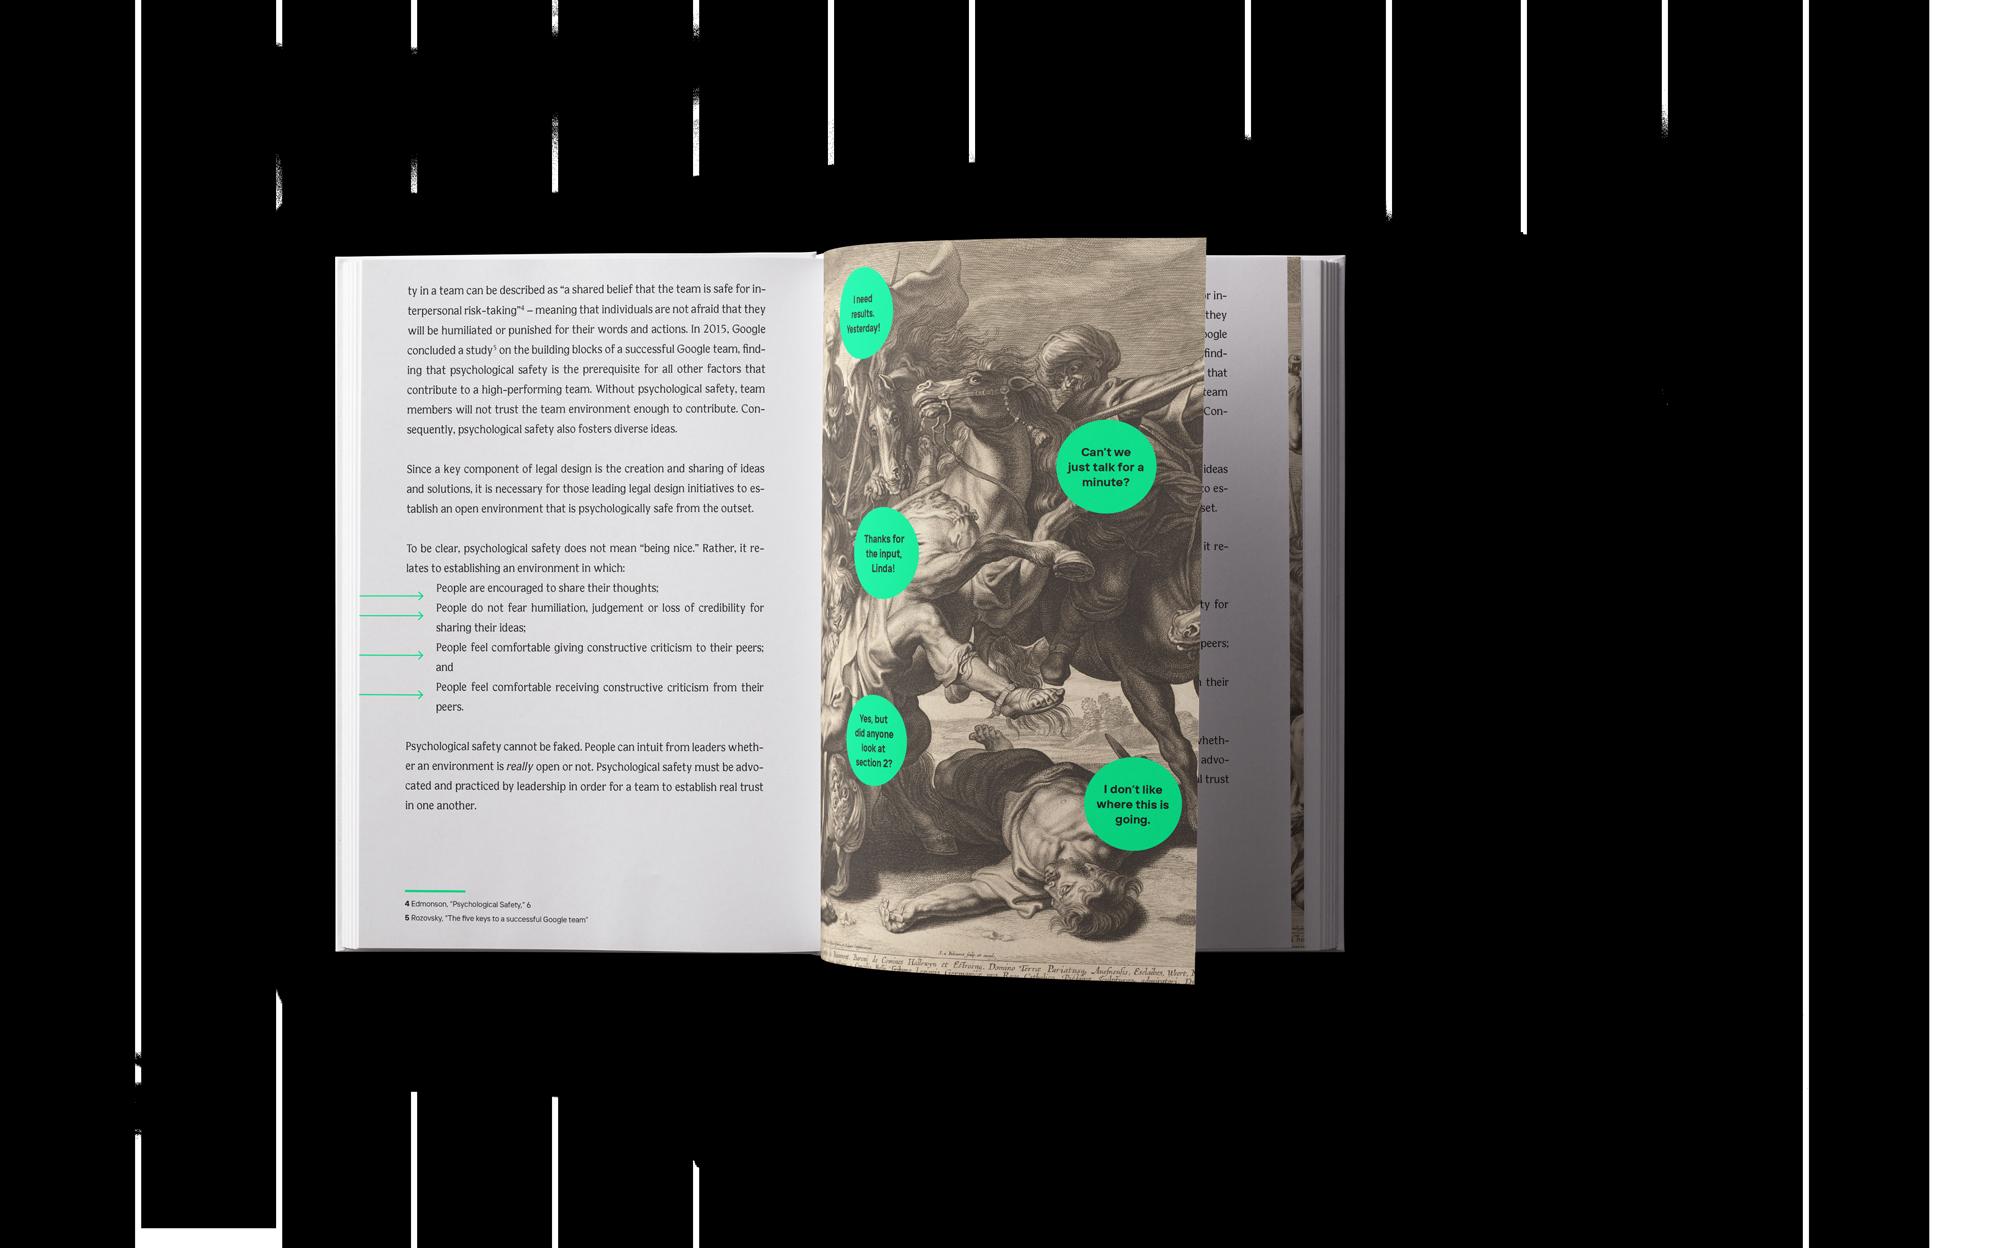 The Legal Design Book interior teaser image